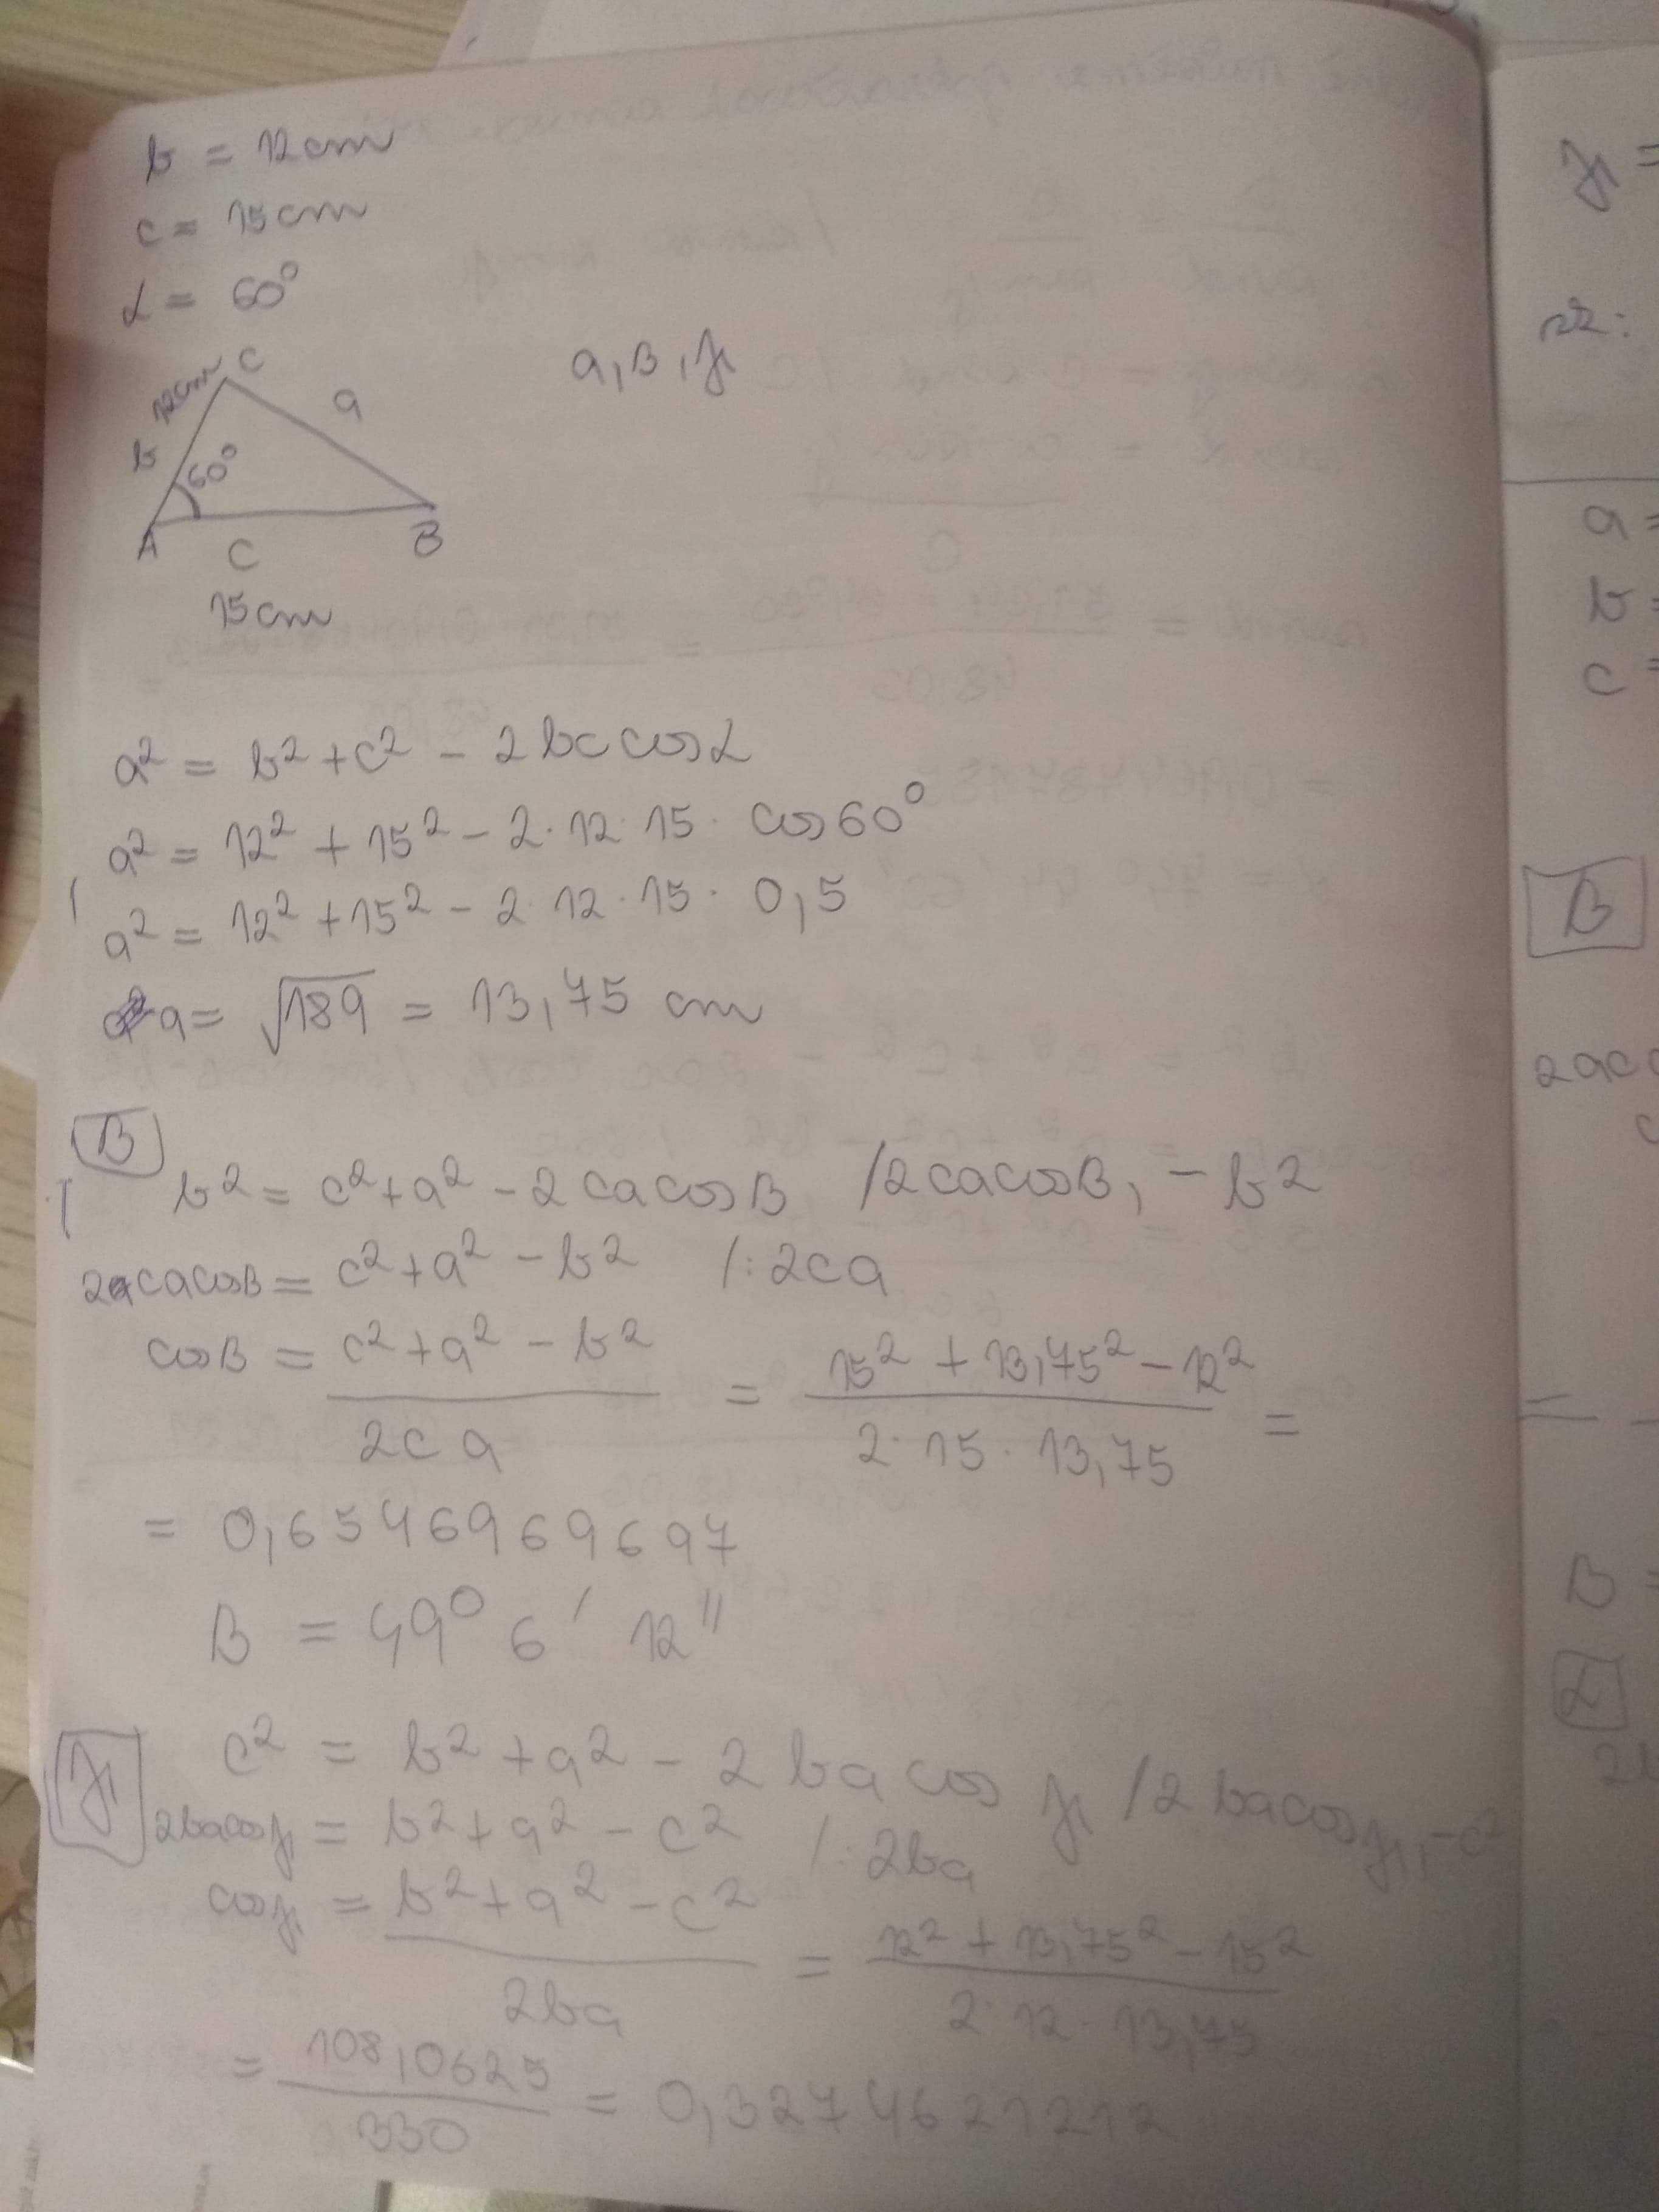 http://forum.matematika.cz/upload3/img/2019-02/17280_received_558899231254347.jpeg